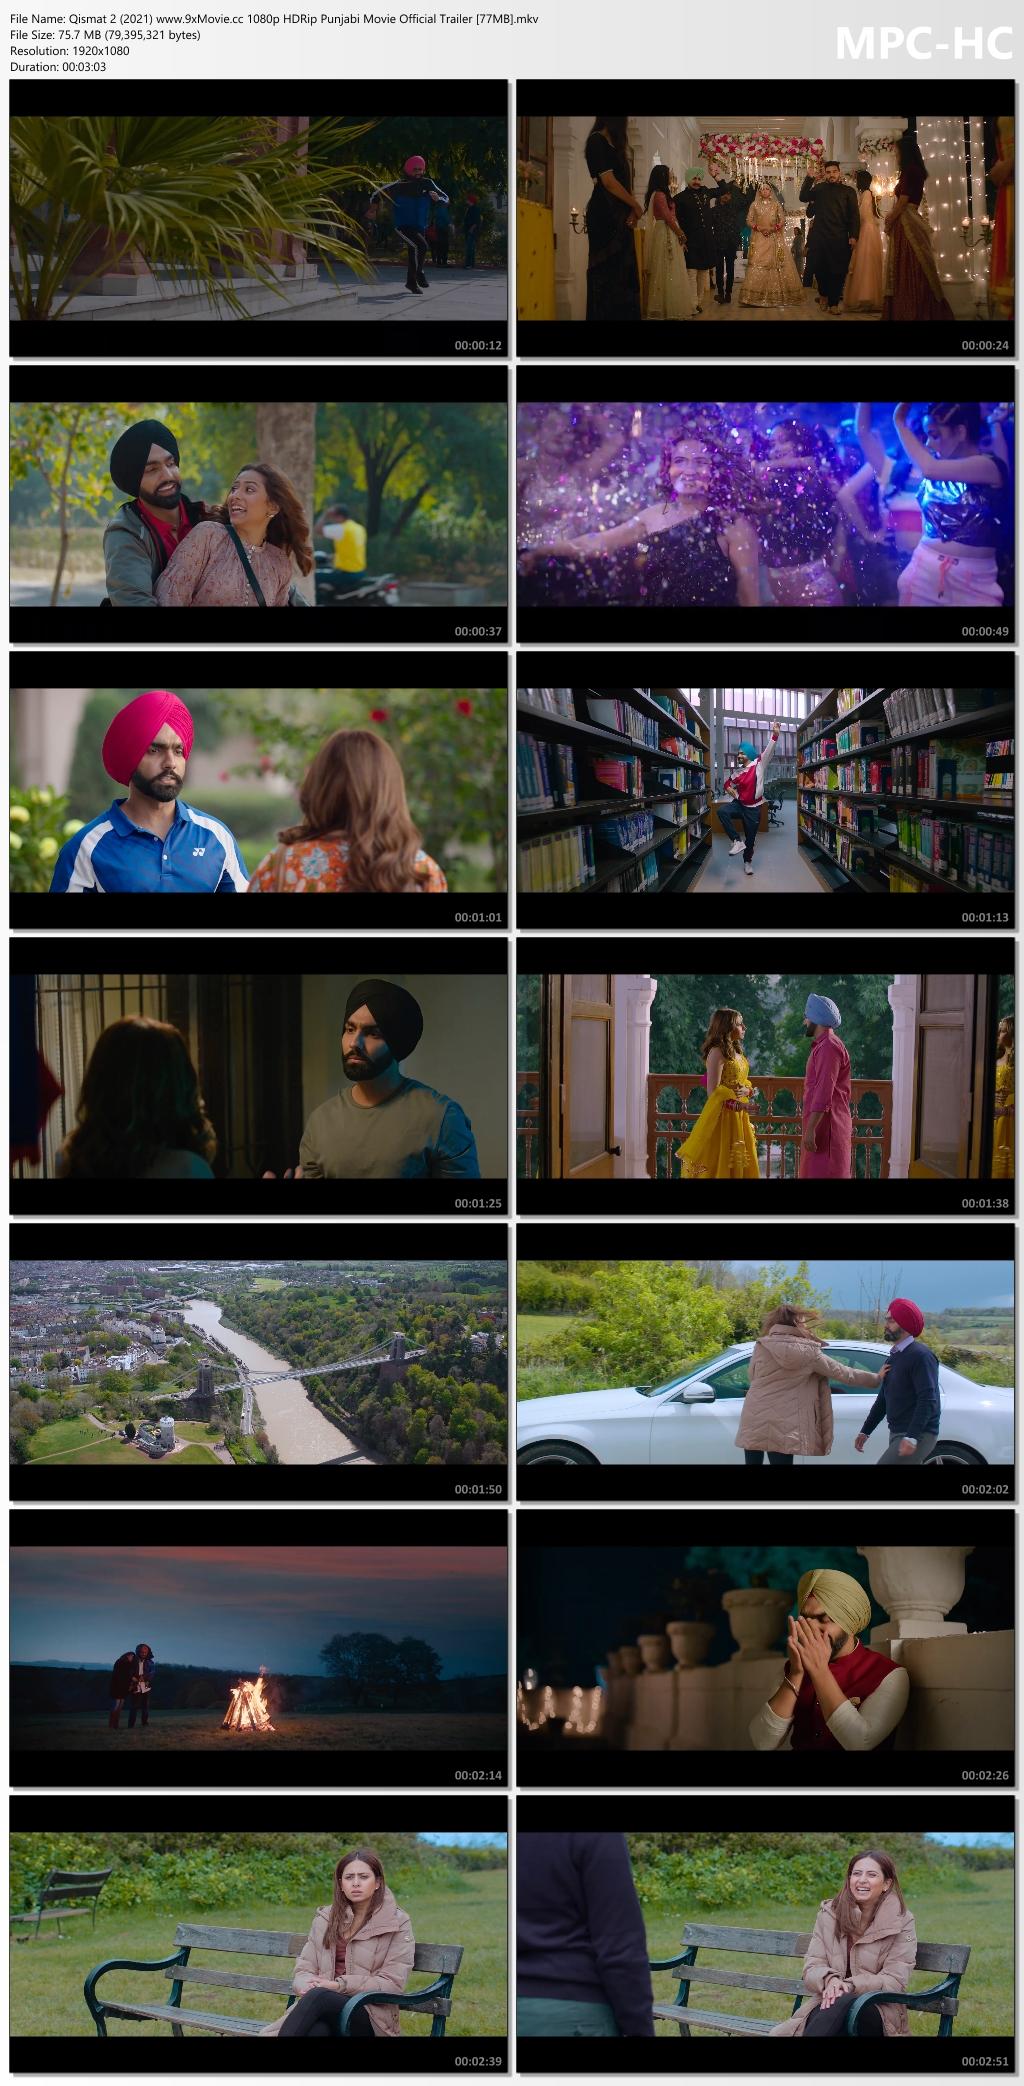 Qismat-2-2021-www-9x-Movie-cc-1080p-HDRip-Punjabi-Movie-Official-Trailer-77-MB-mkv